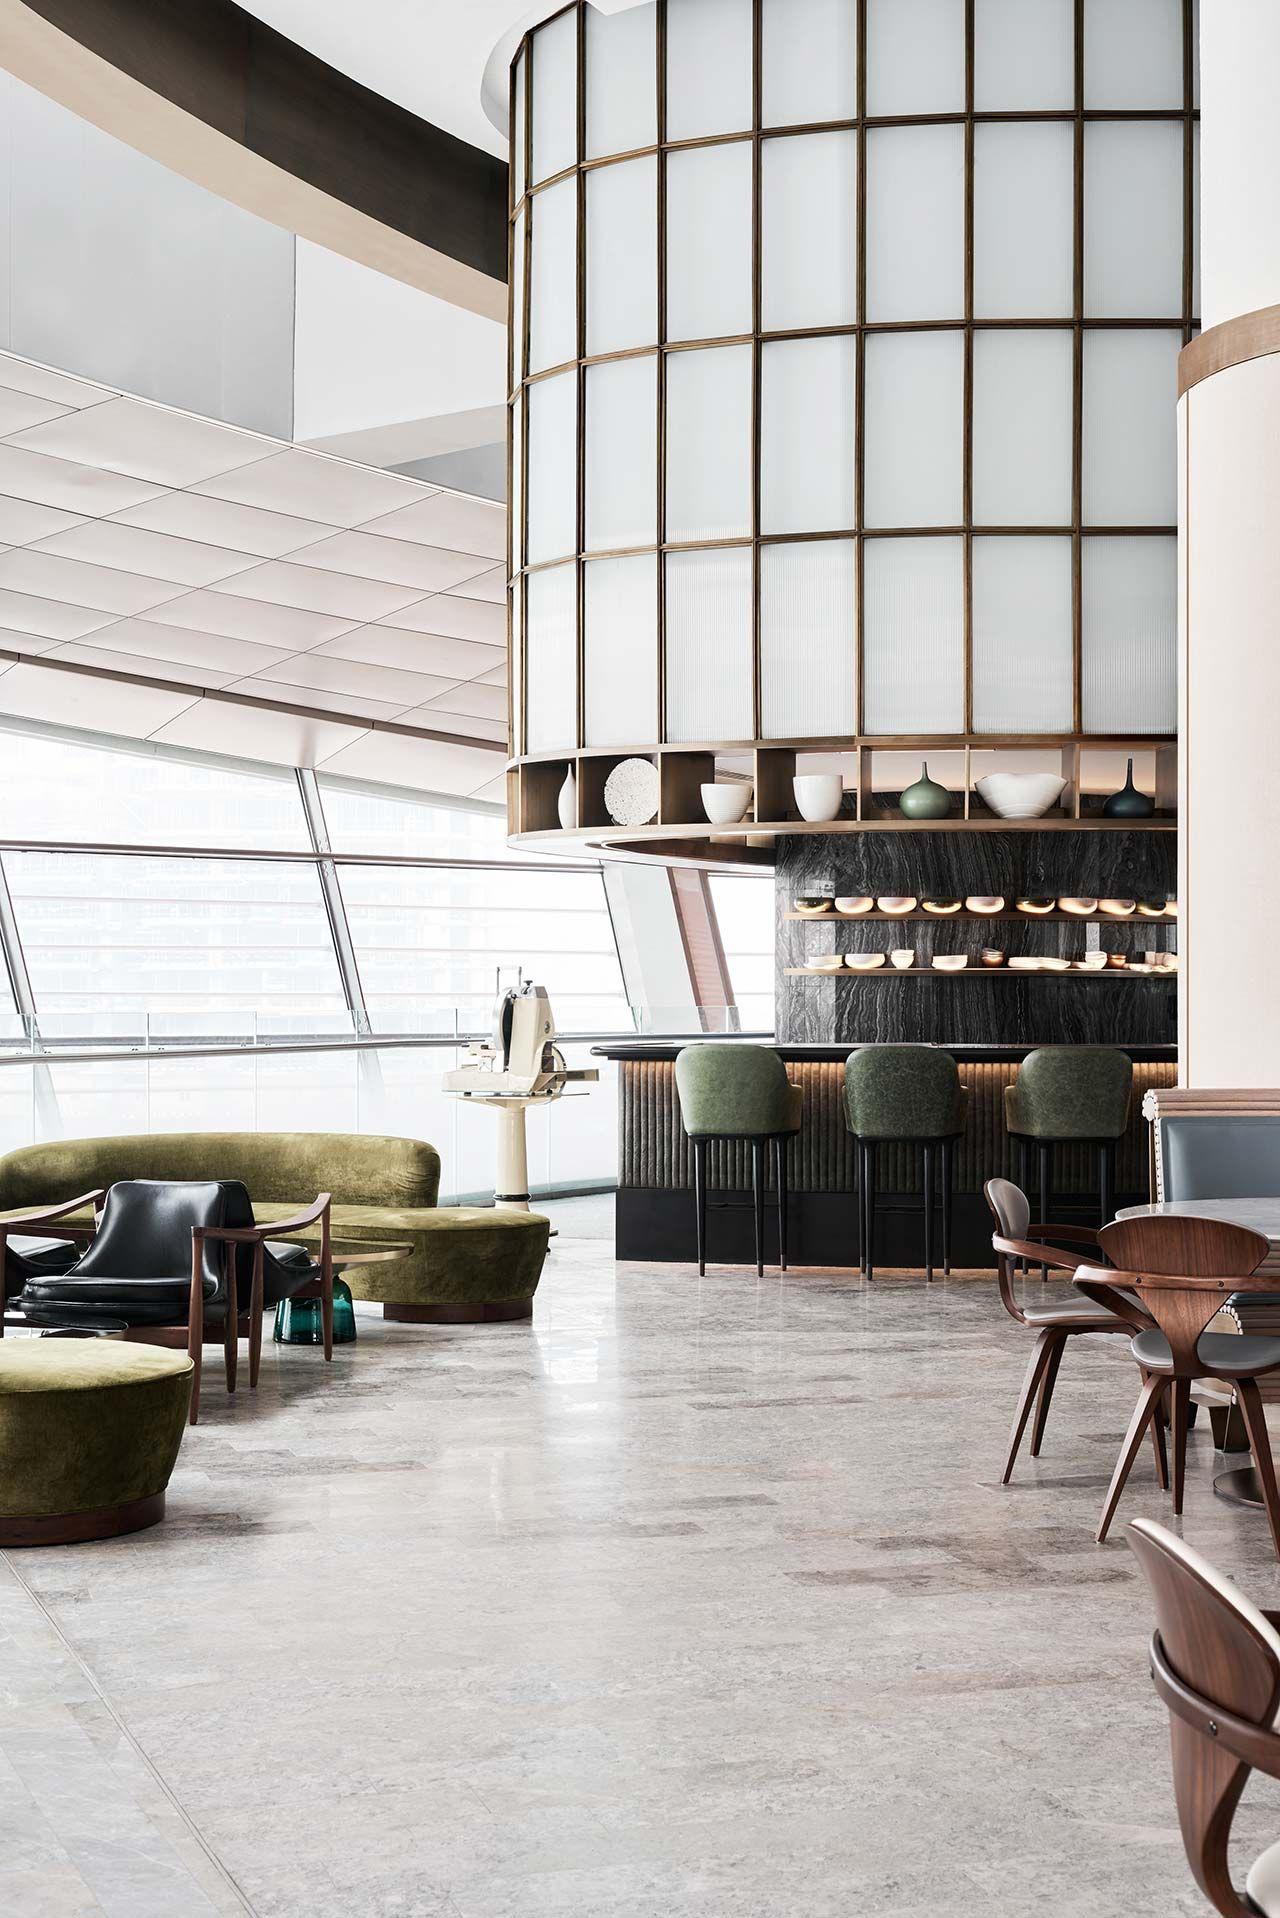 Sean connolly at dubai opera hotel restaurant design for Raumgestaltung cafe